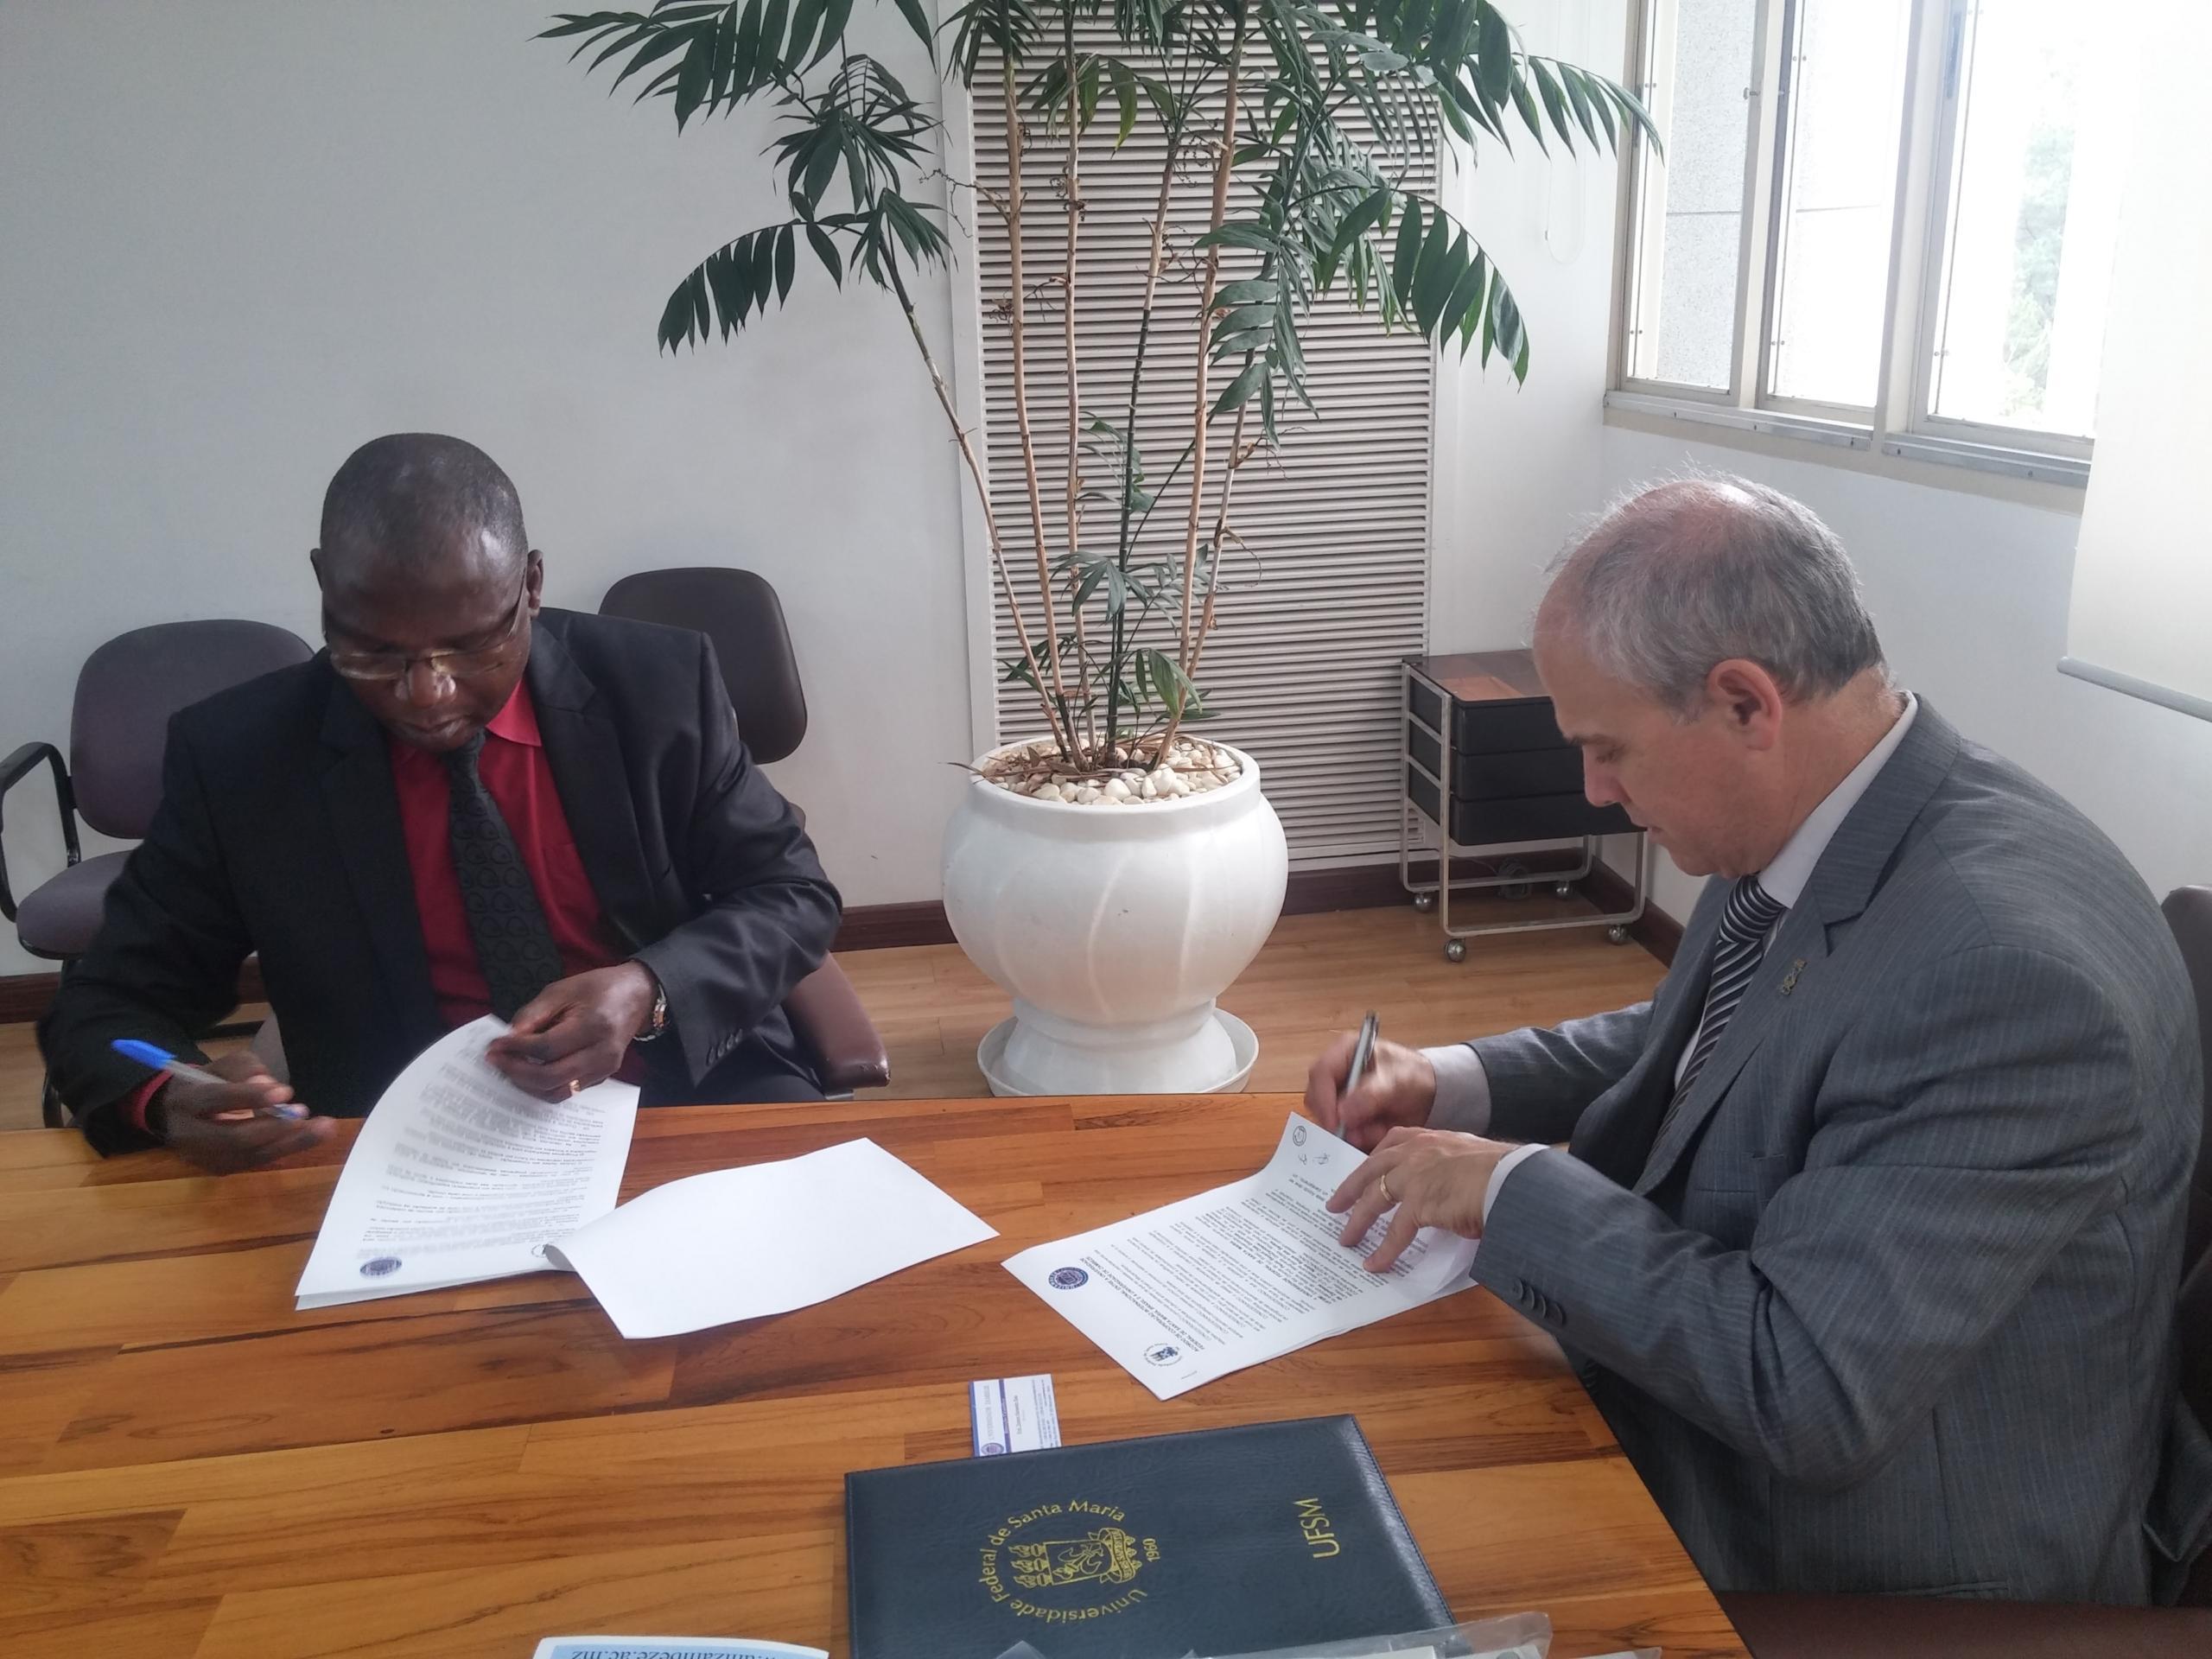 12 09 2017 Assinatura acordo Unizambeze Mirian Quadros 3